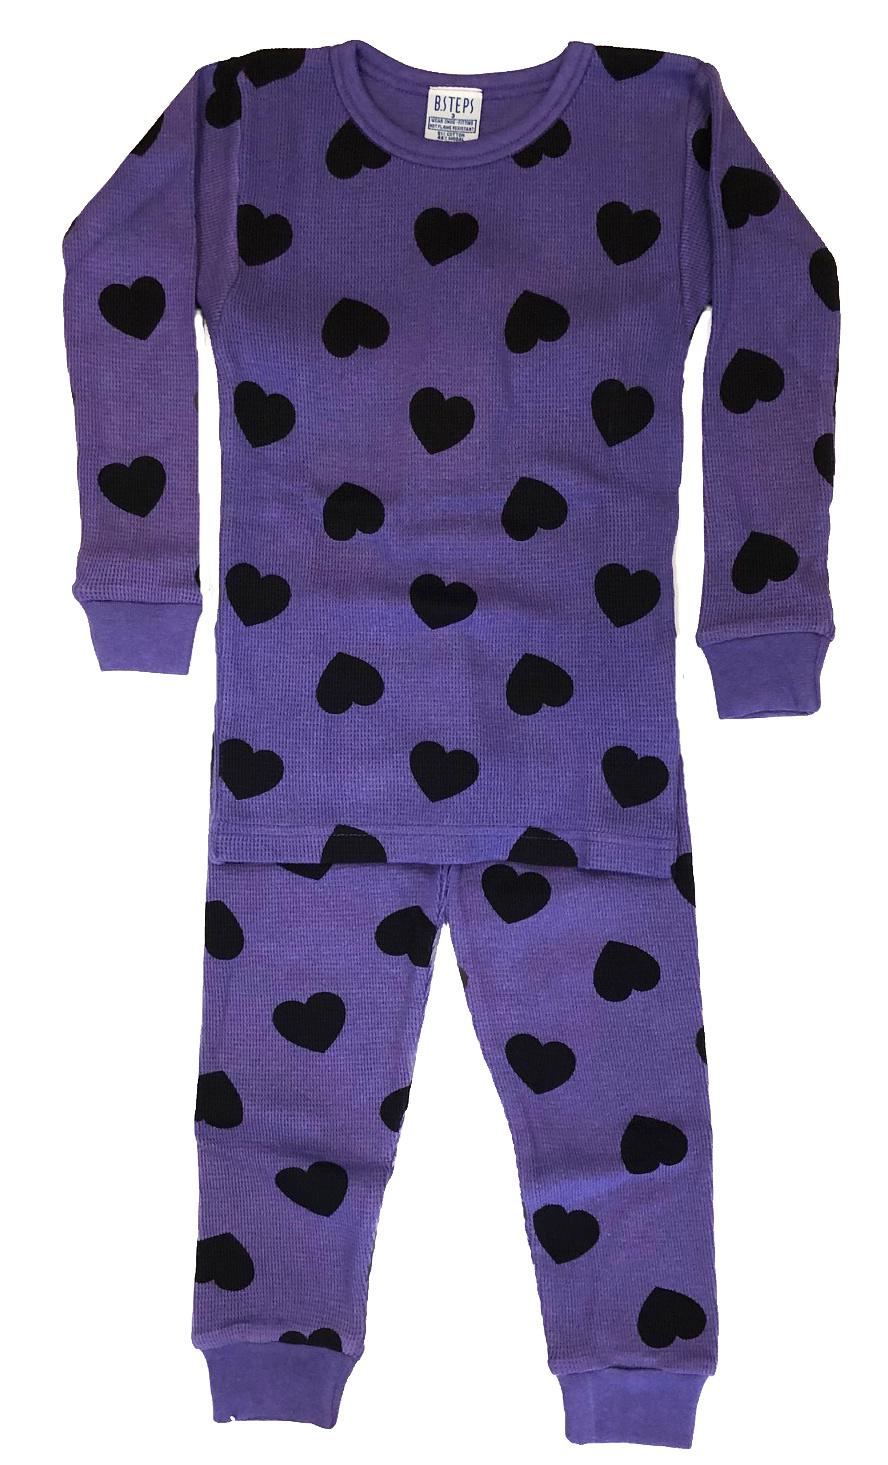 Baby Steps Grape Thermal Infant PJ Set